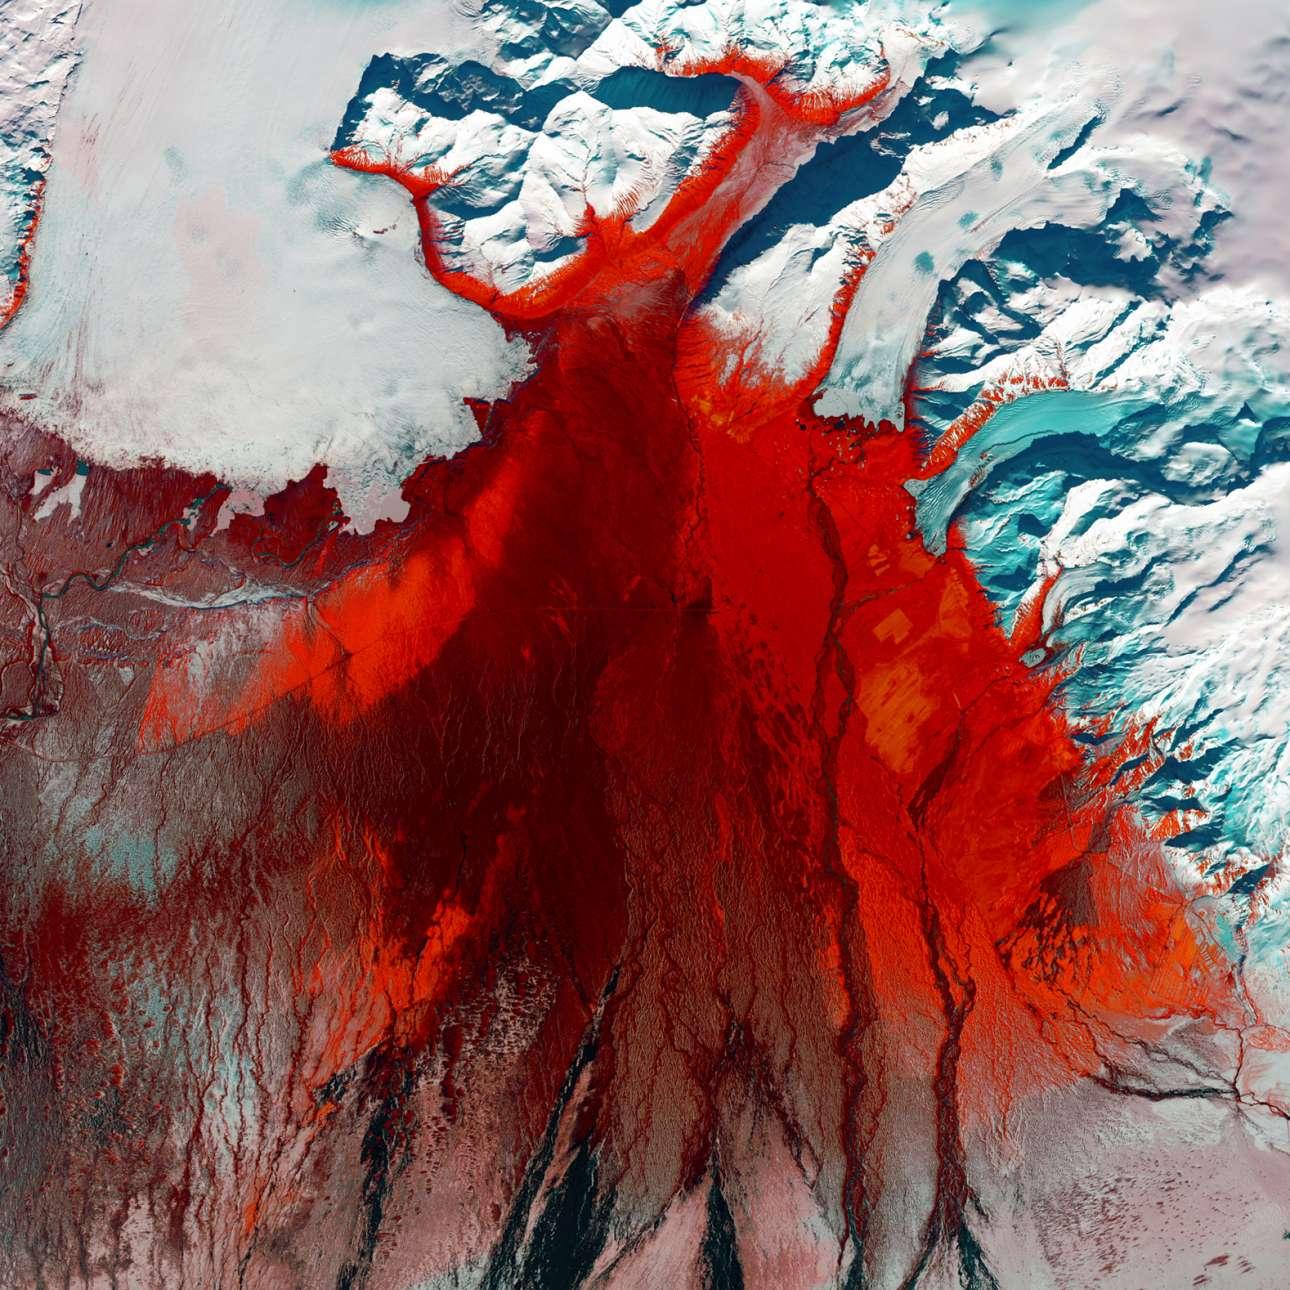 H πεδιάδα Skeiðarársandur στην Ισλανδία είναι μια από τις μεγαλύτερες πεδιάδες στον πλανήτη όπου κυριαρχούν μόνιμοι παγετώνες. Όταν σε κάποια σημεία οι παγετώνες λιώνουν δημιουργούνται διαφόρων ειδών γεωλογικοί σχηματισμοί οι οποίοι αποκτούν τελικά μια γκρίζα-μαύρη απόχρωση. Το κόκκινο χρώμα υποδεικνύει την παρουσία χαμηλής βλάστησης στην περιοχή (χόρτα, βρύα, θάμνοι)